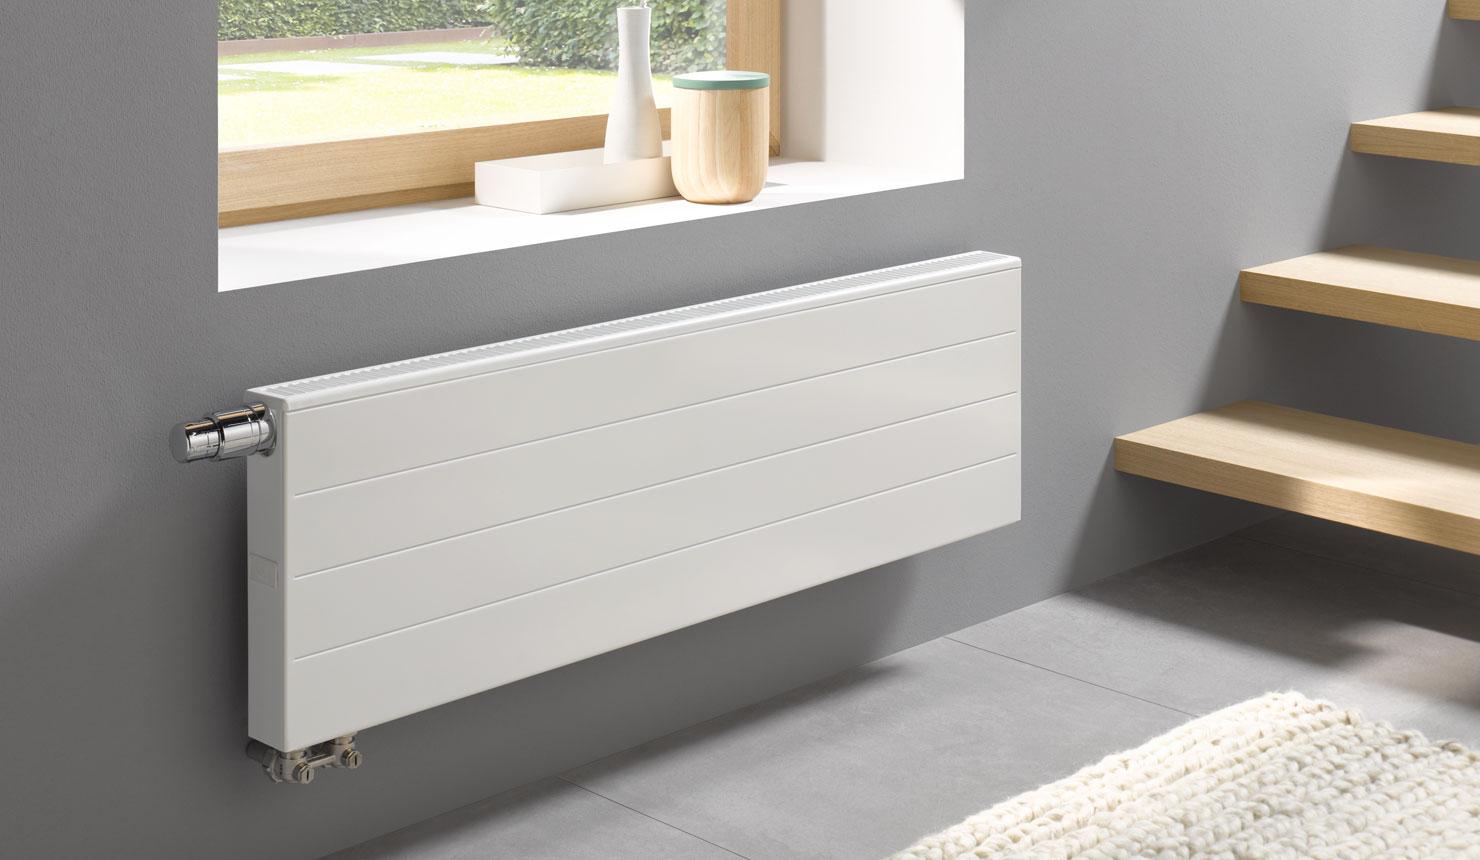 kermi du o kabinos ir vonios radiatoriai. Black Bedroom Furniture Sets. Home Design Ideas